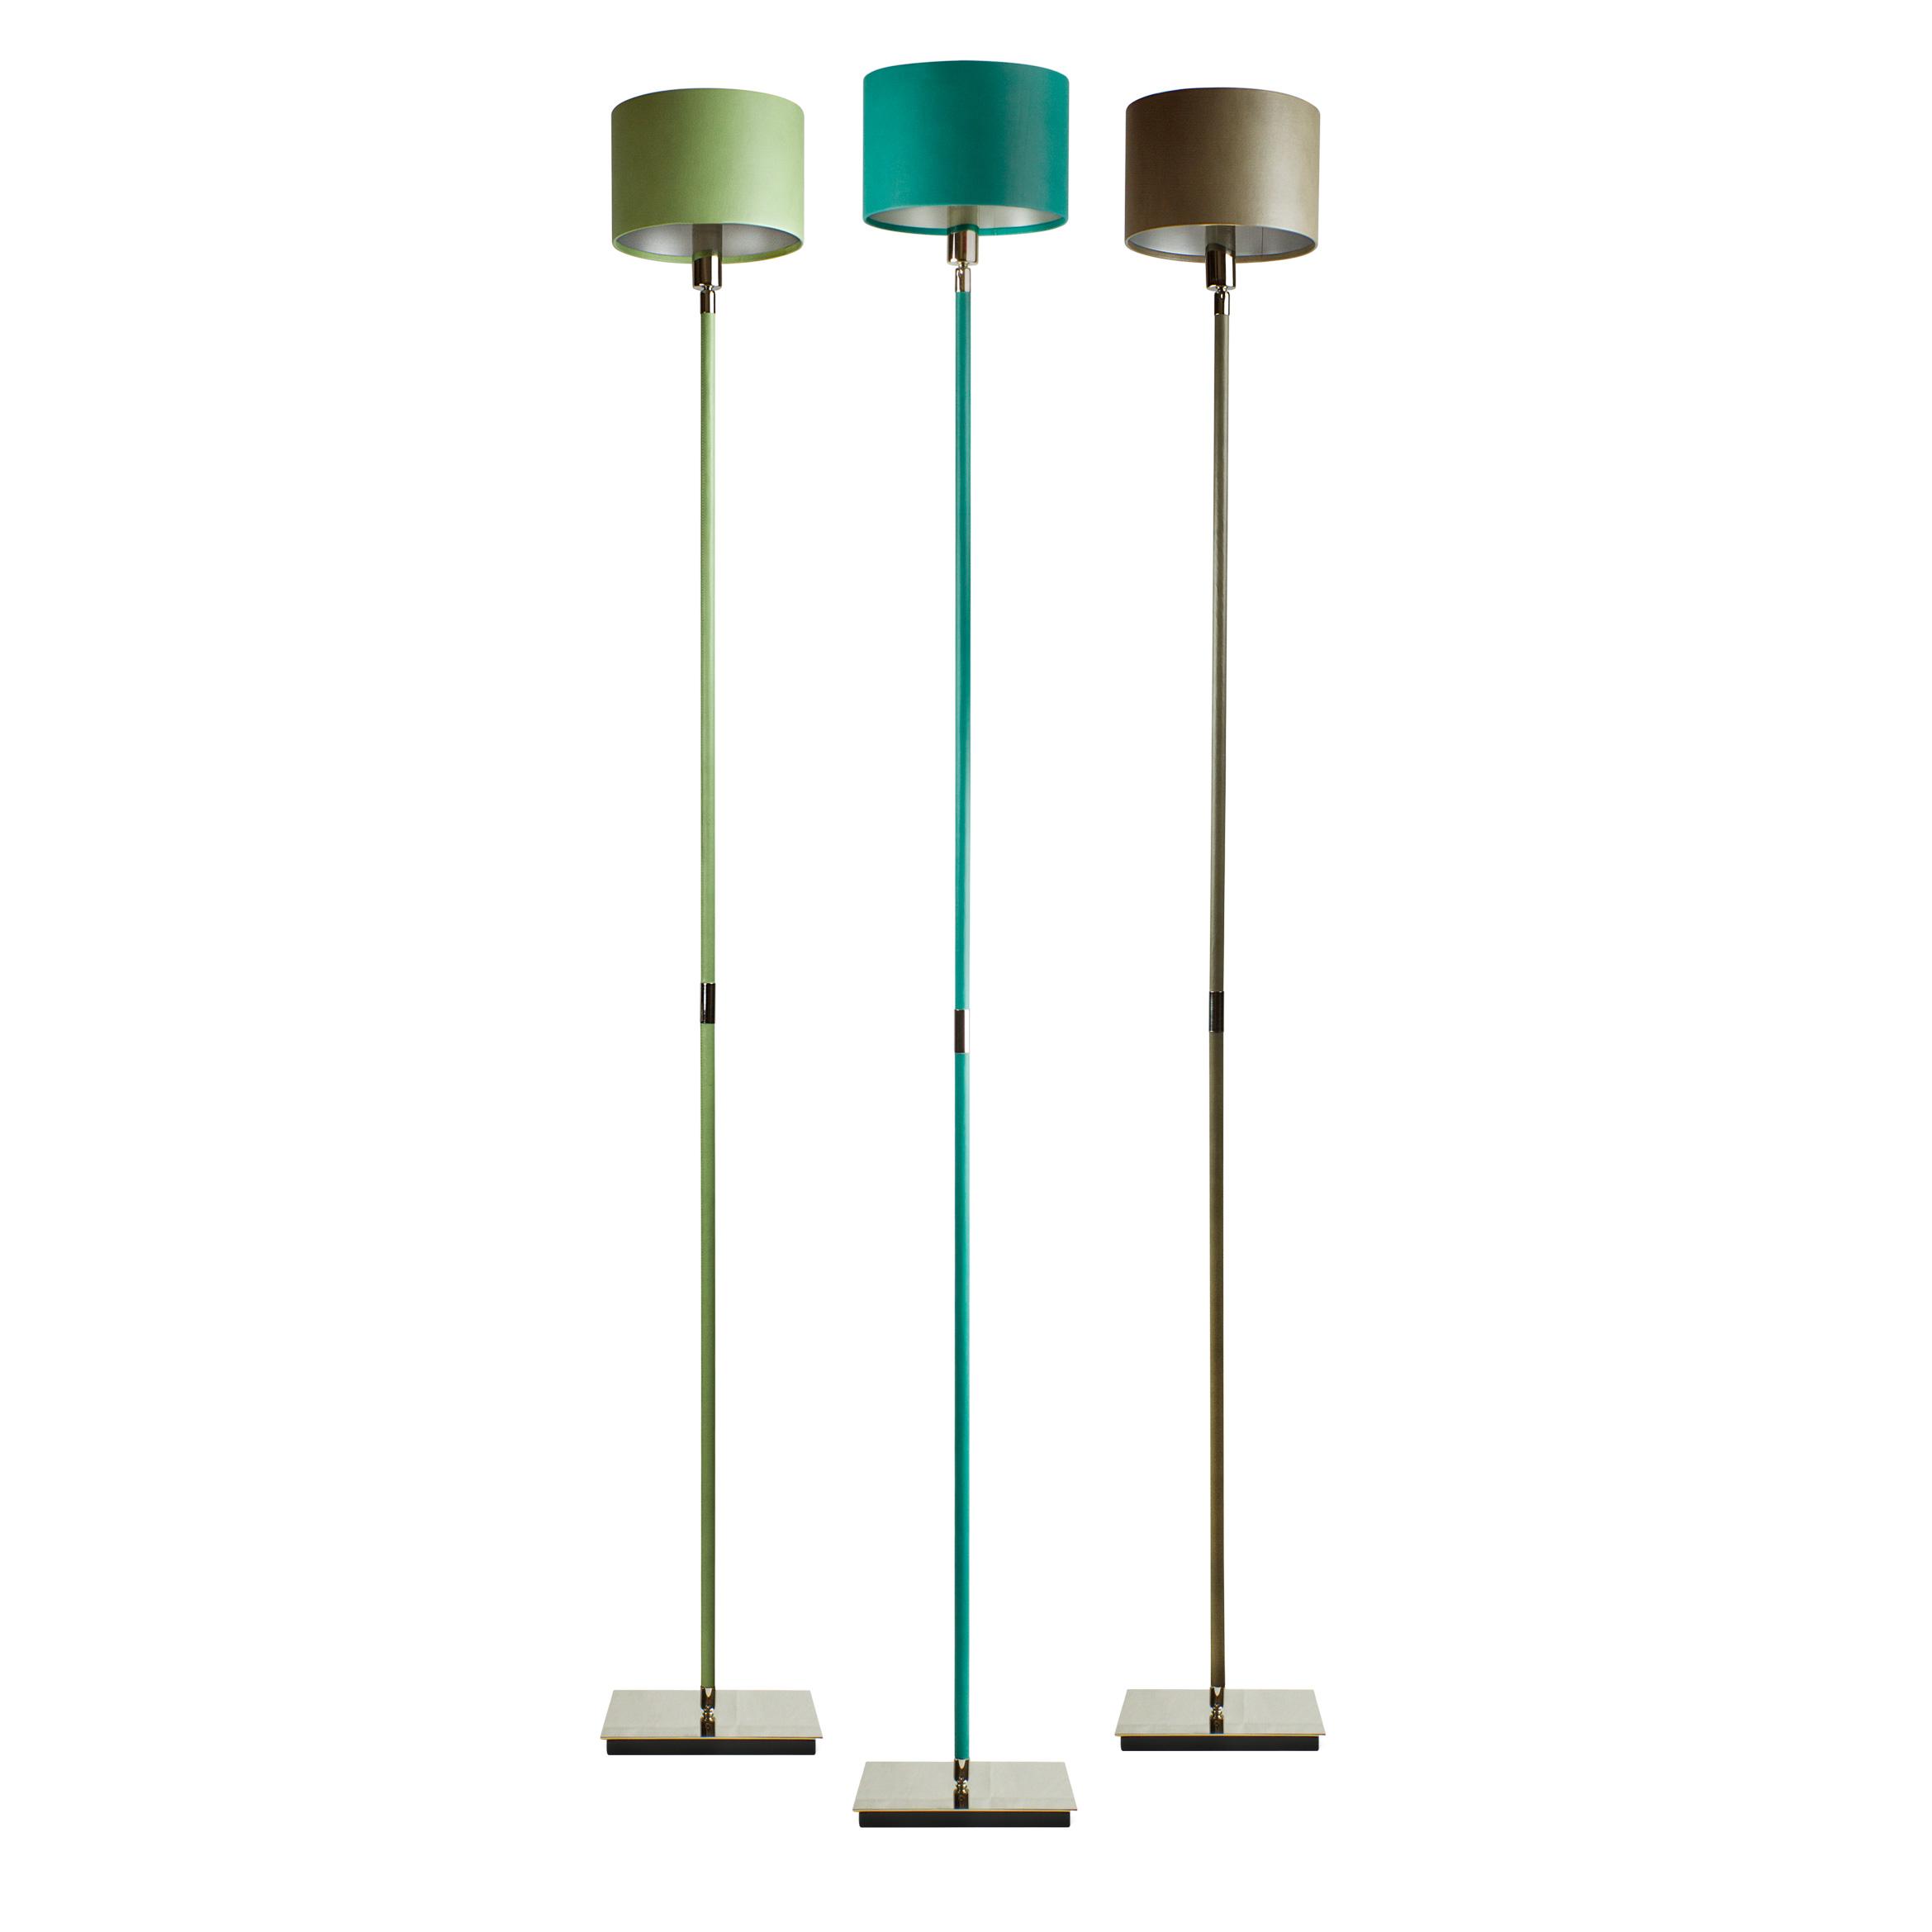 Linea claudio marco villaverde london linea metal leather floor lamp square aloadofball Image collections